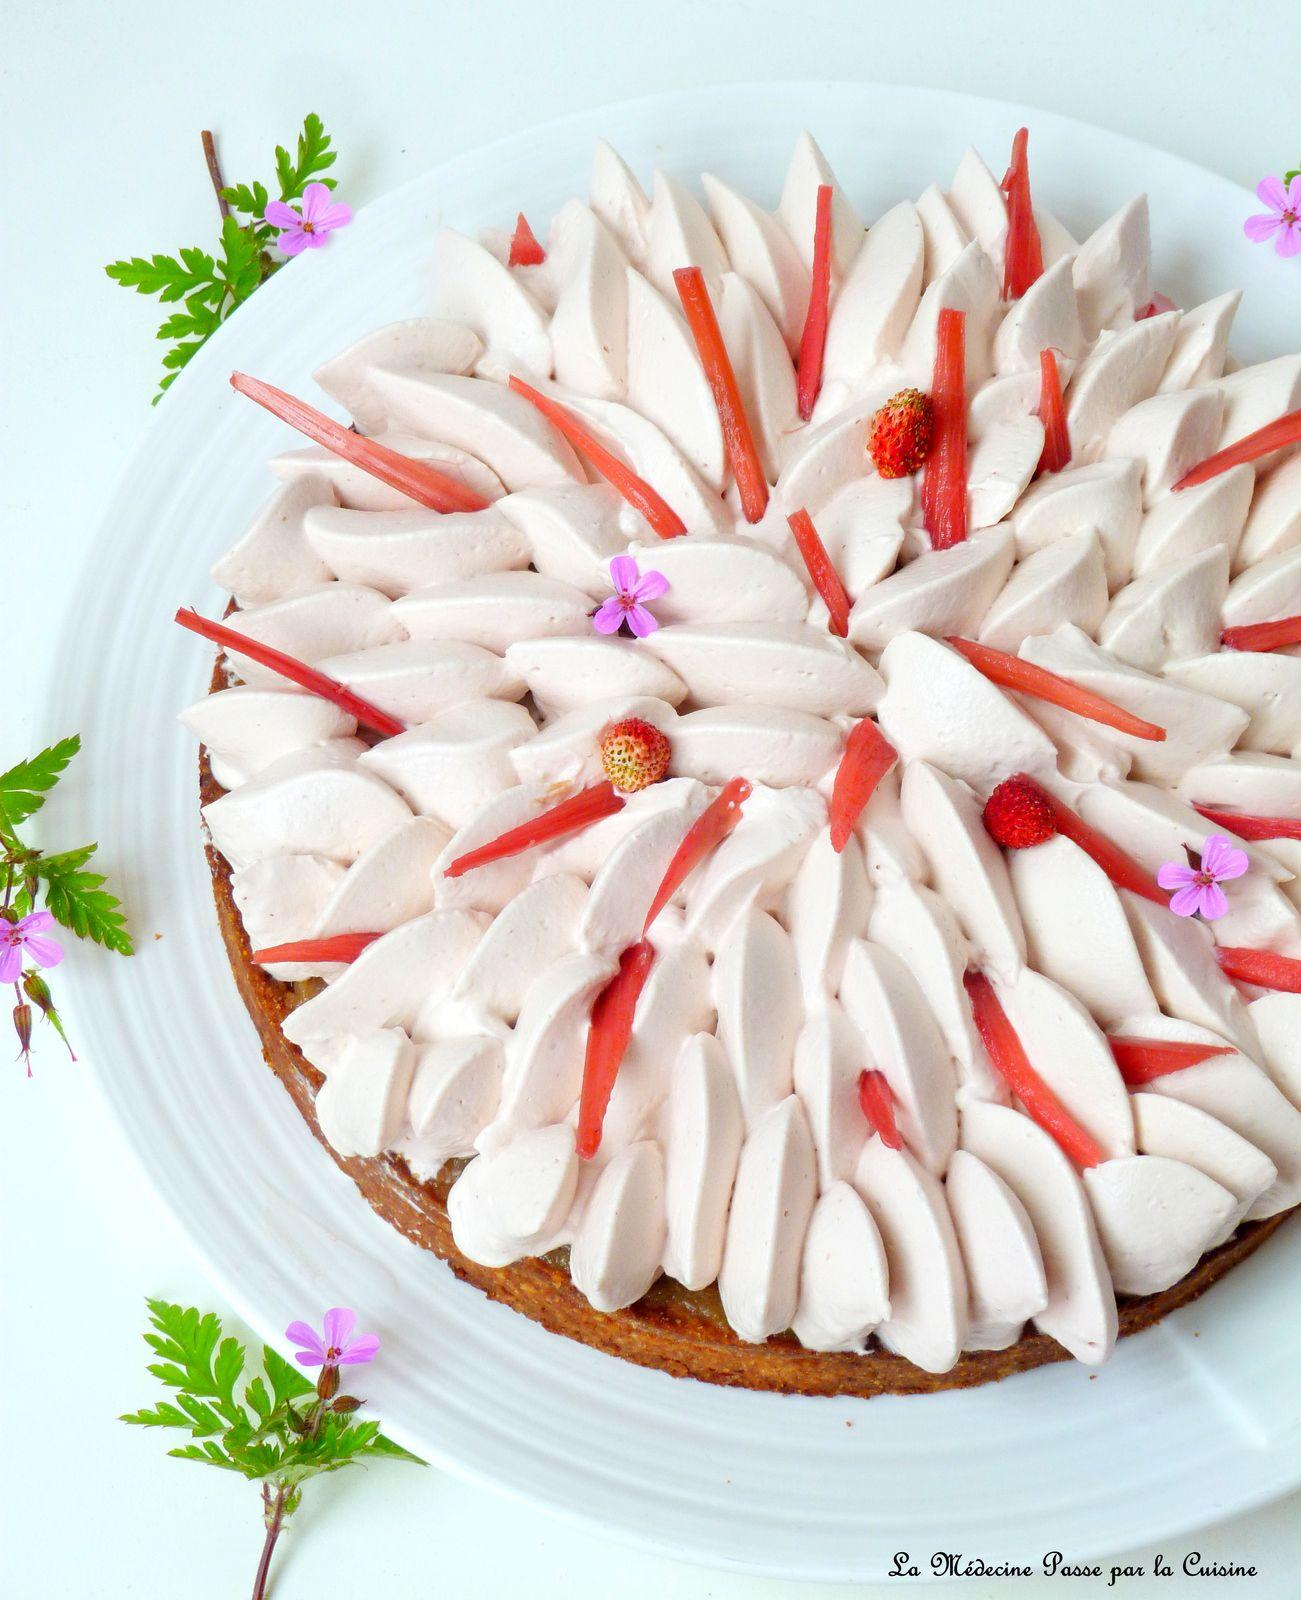 Tarte rhubarbe et nuage de fraise